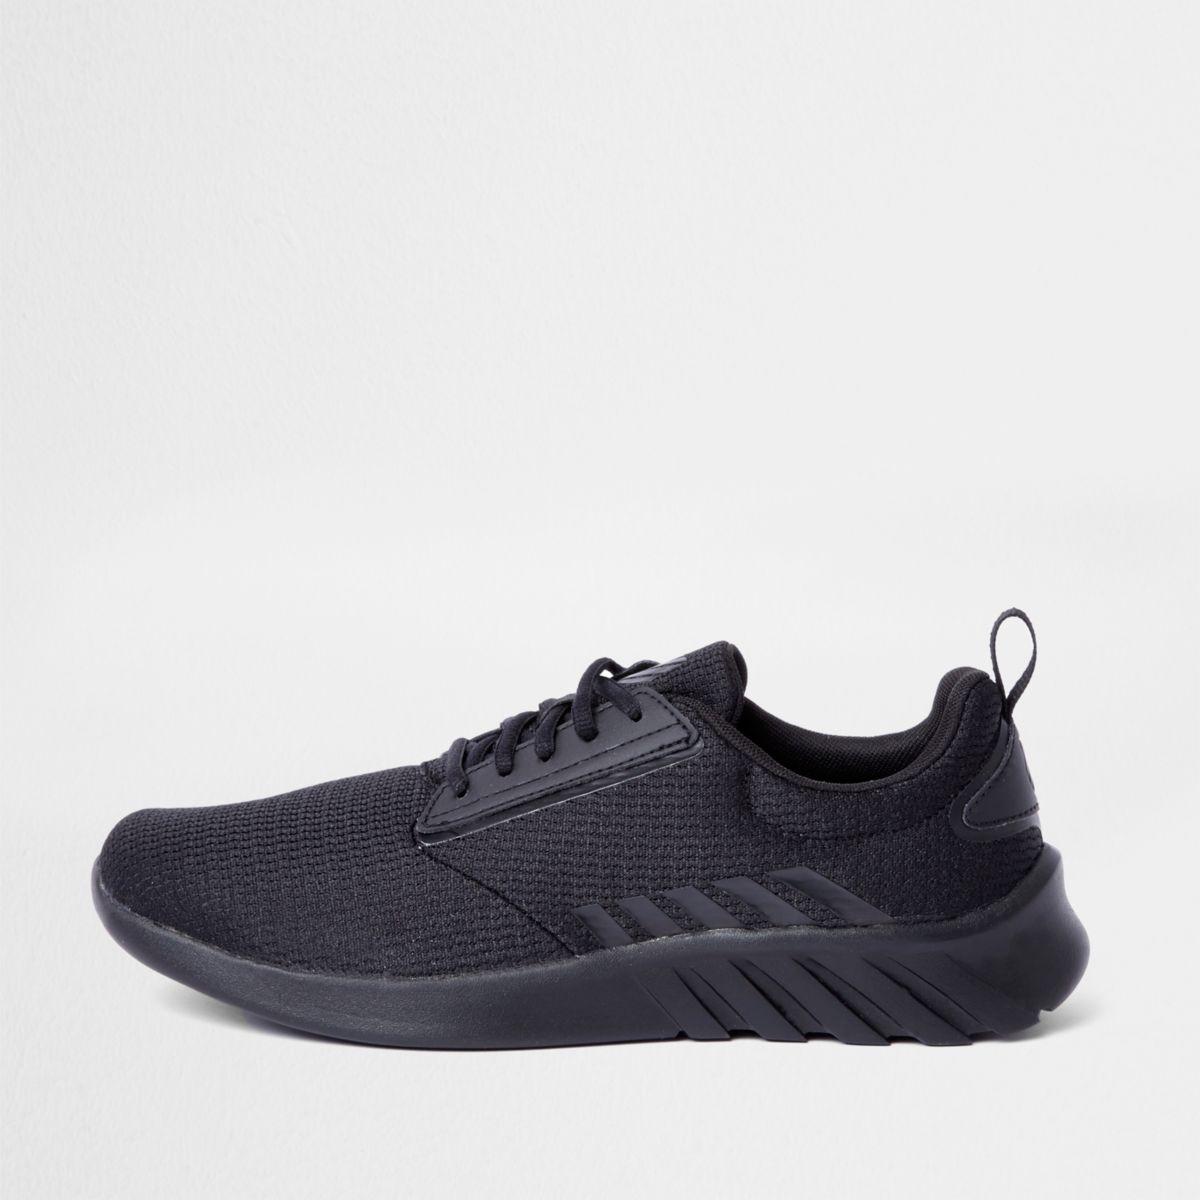 K-Swiss black mesh sports runner sneakers